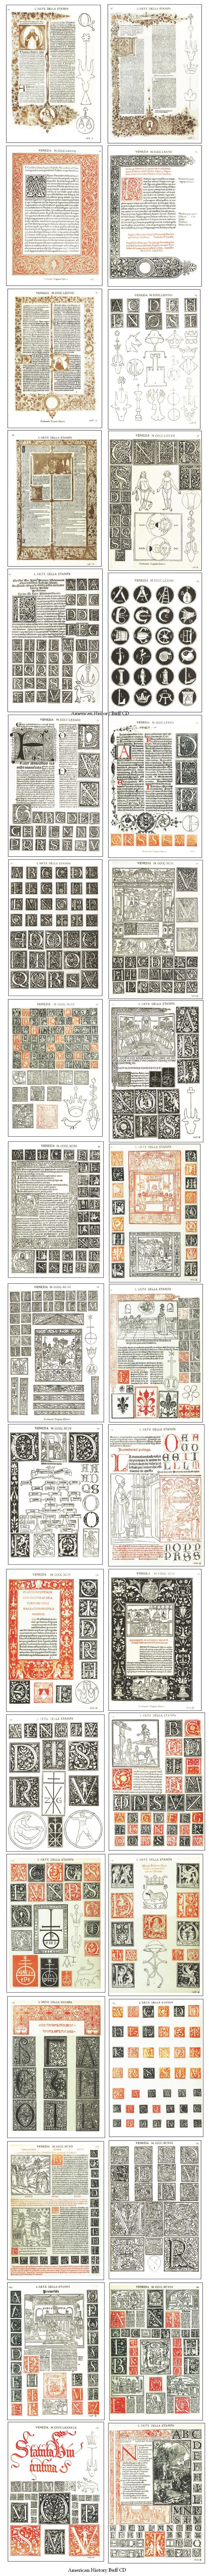 Venetian Typography Italian Renaissance Woodcut Printing Illuminated Manuscript   eBay